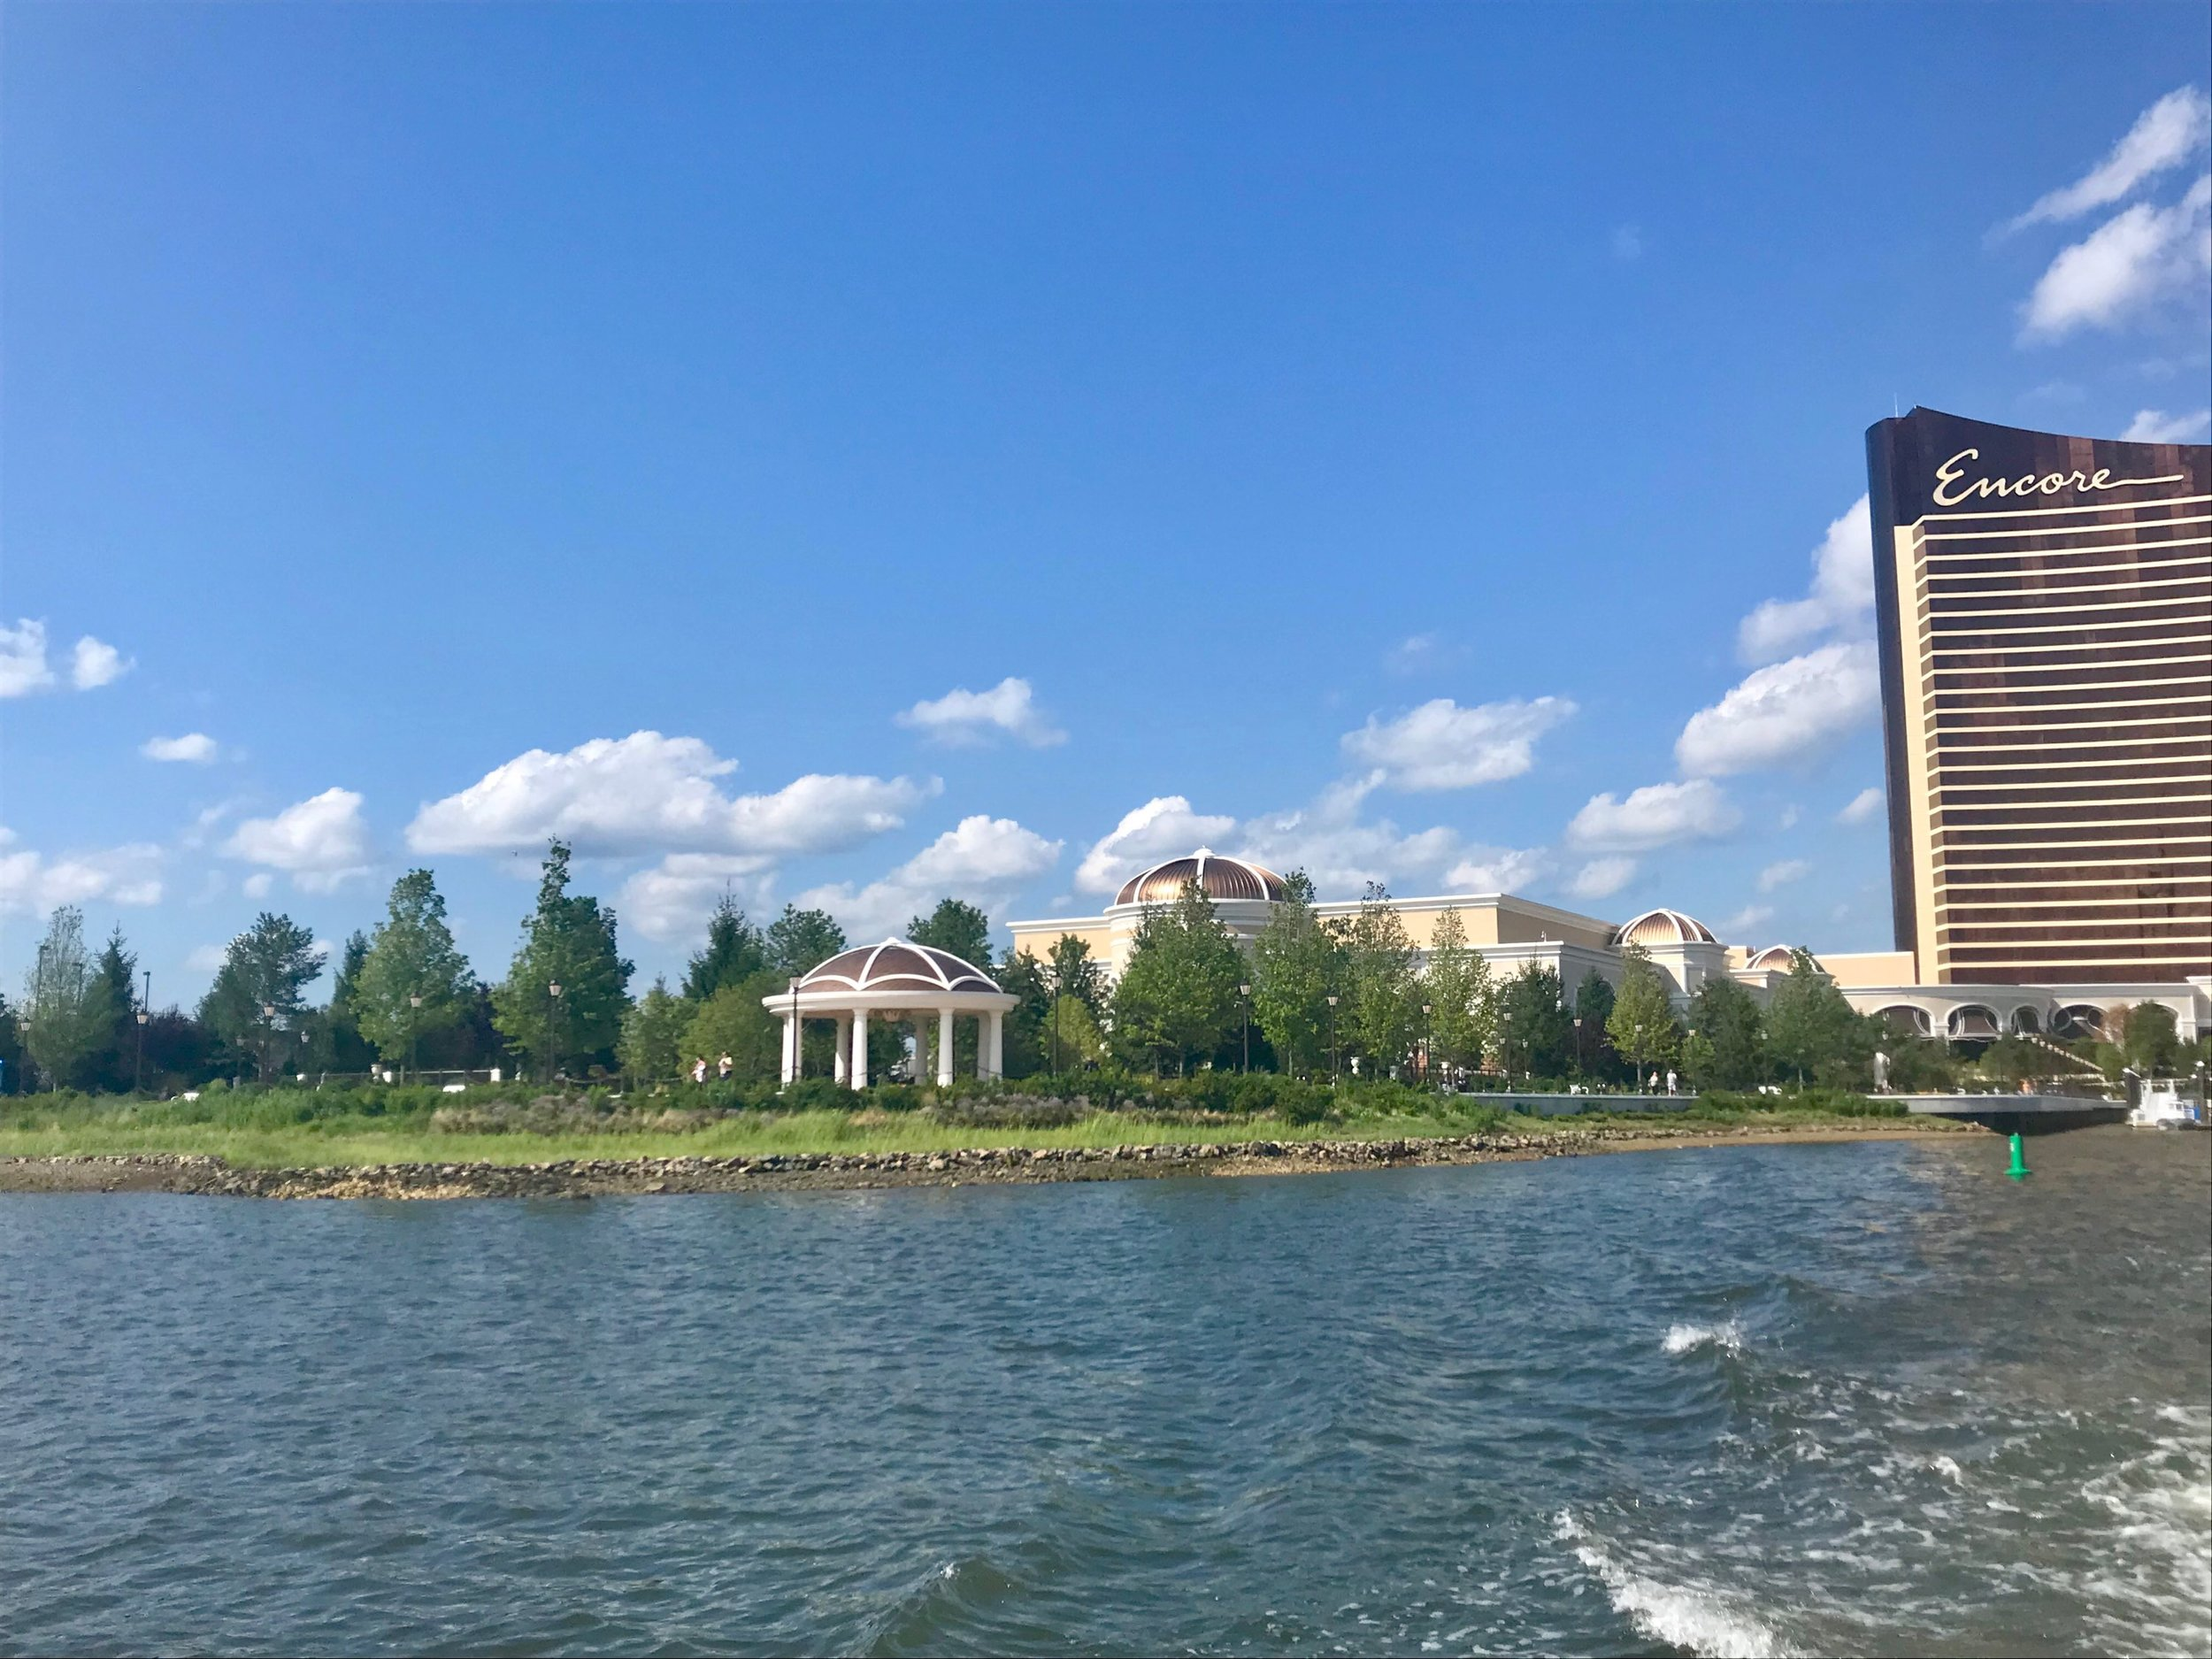 Encore Boston Harbor's living shoreline